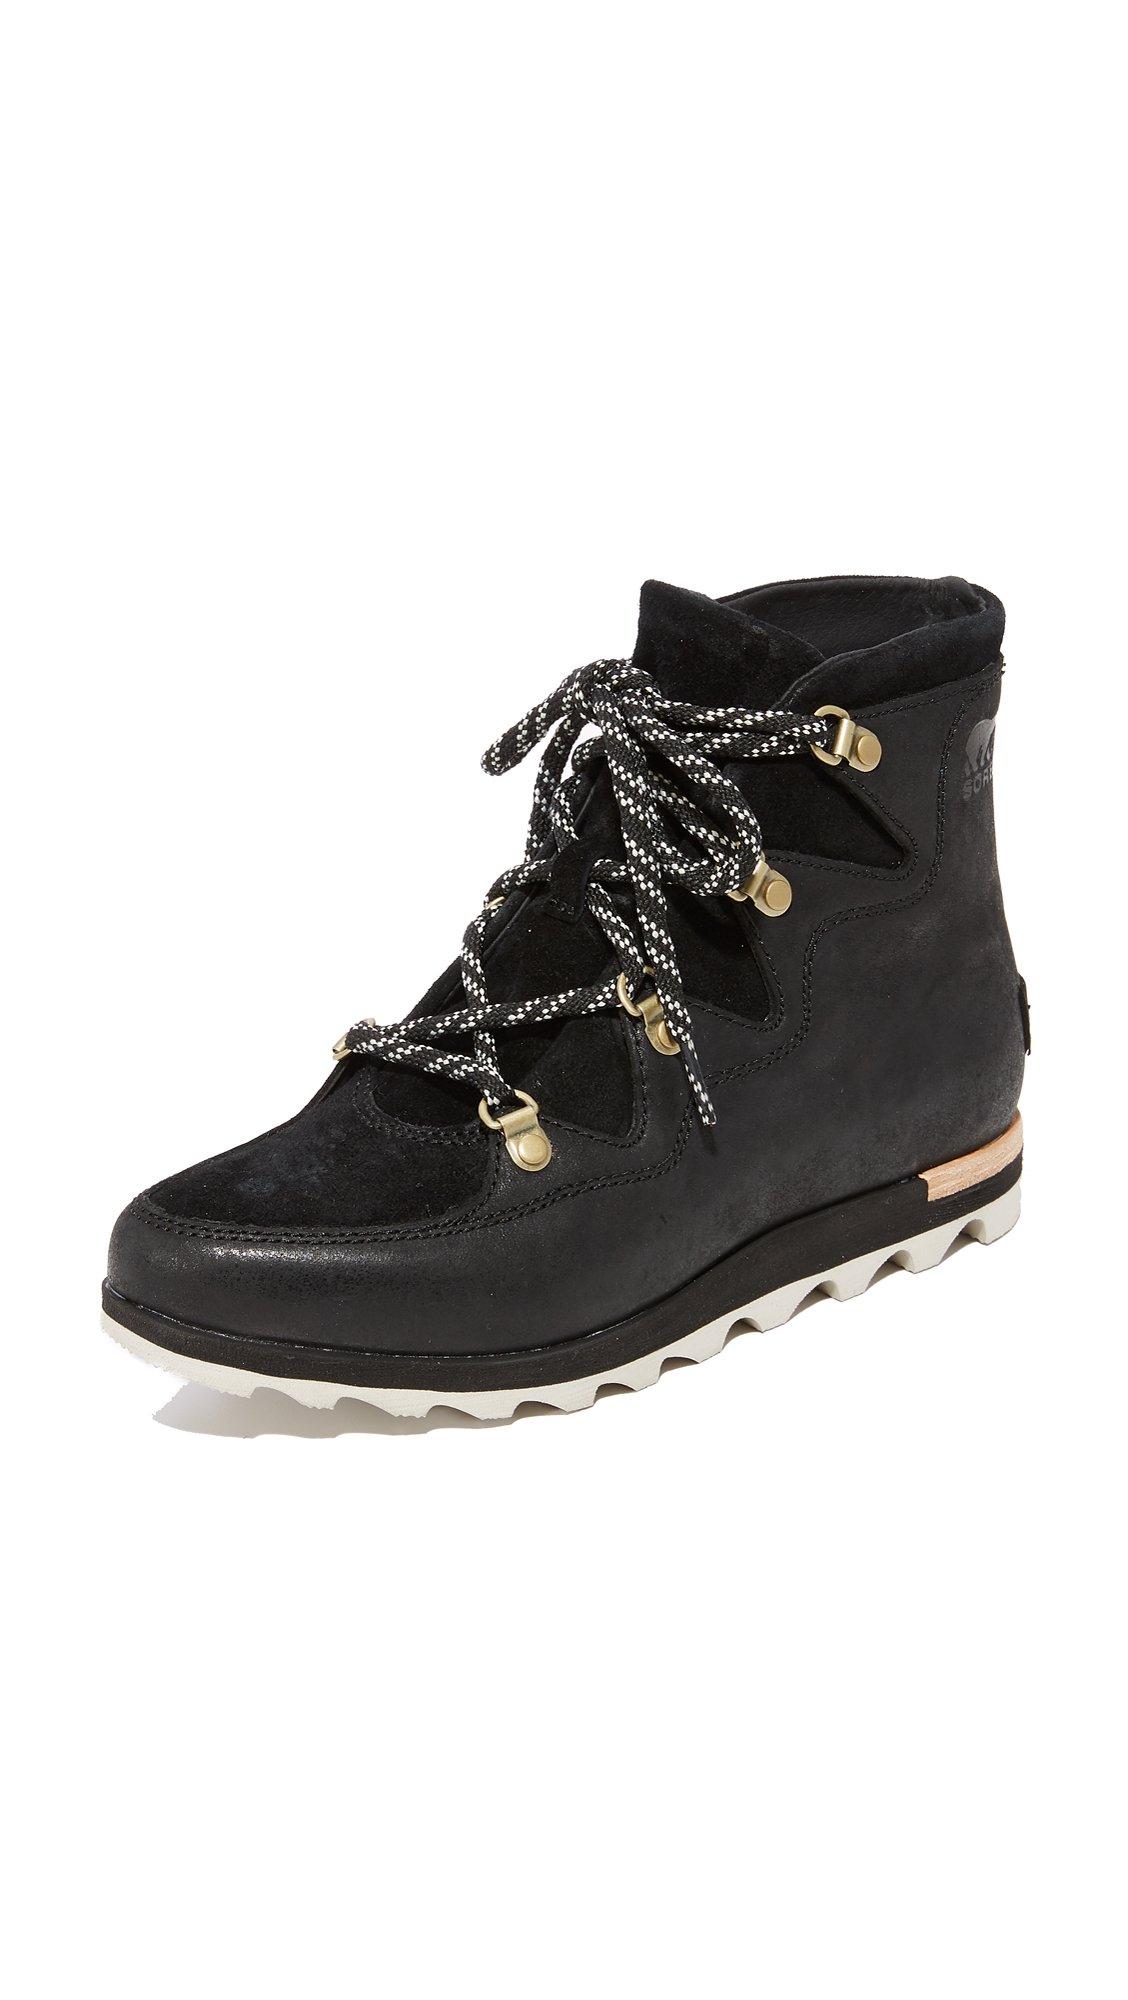 Sorel Women's Sneakchic Alpine Booties, Black, 8.5 B(M) US by SOREL